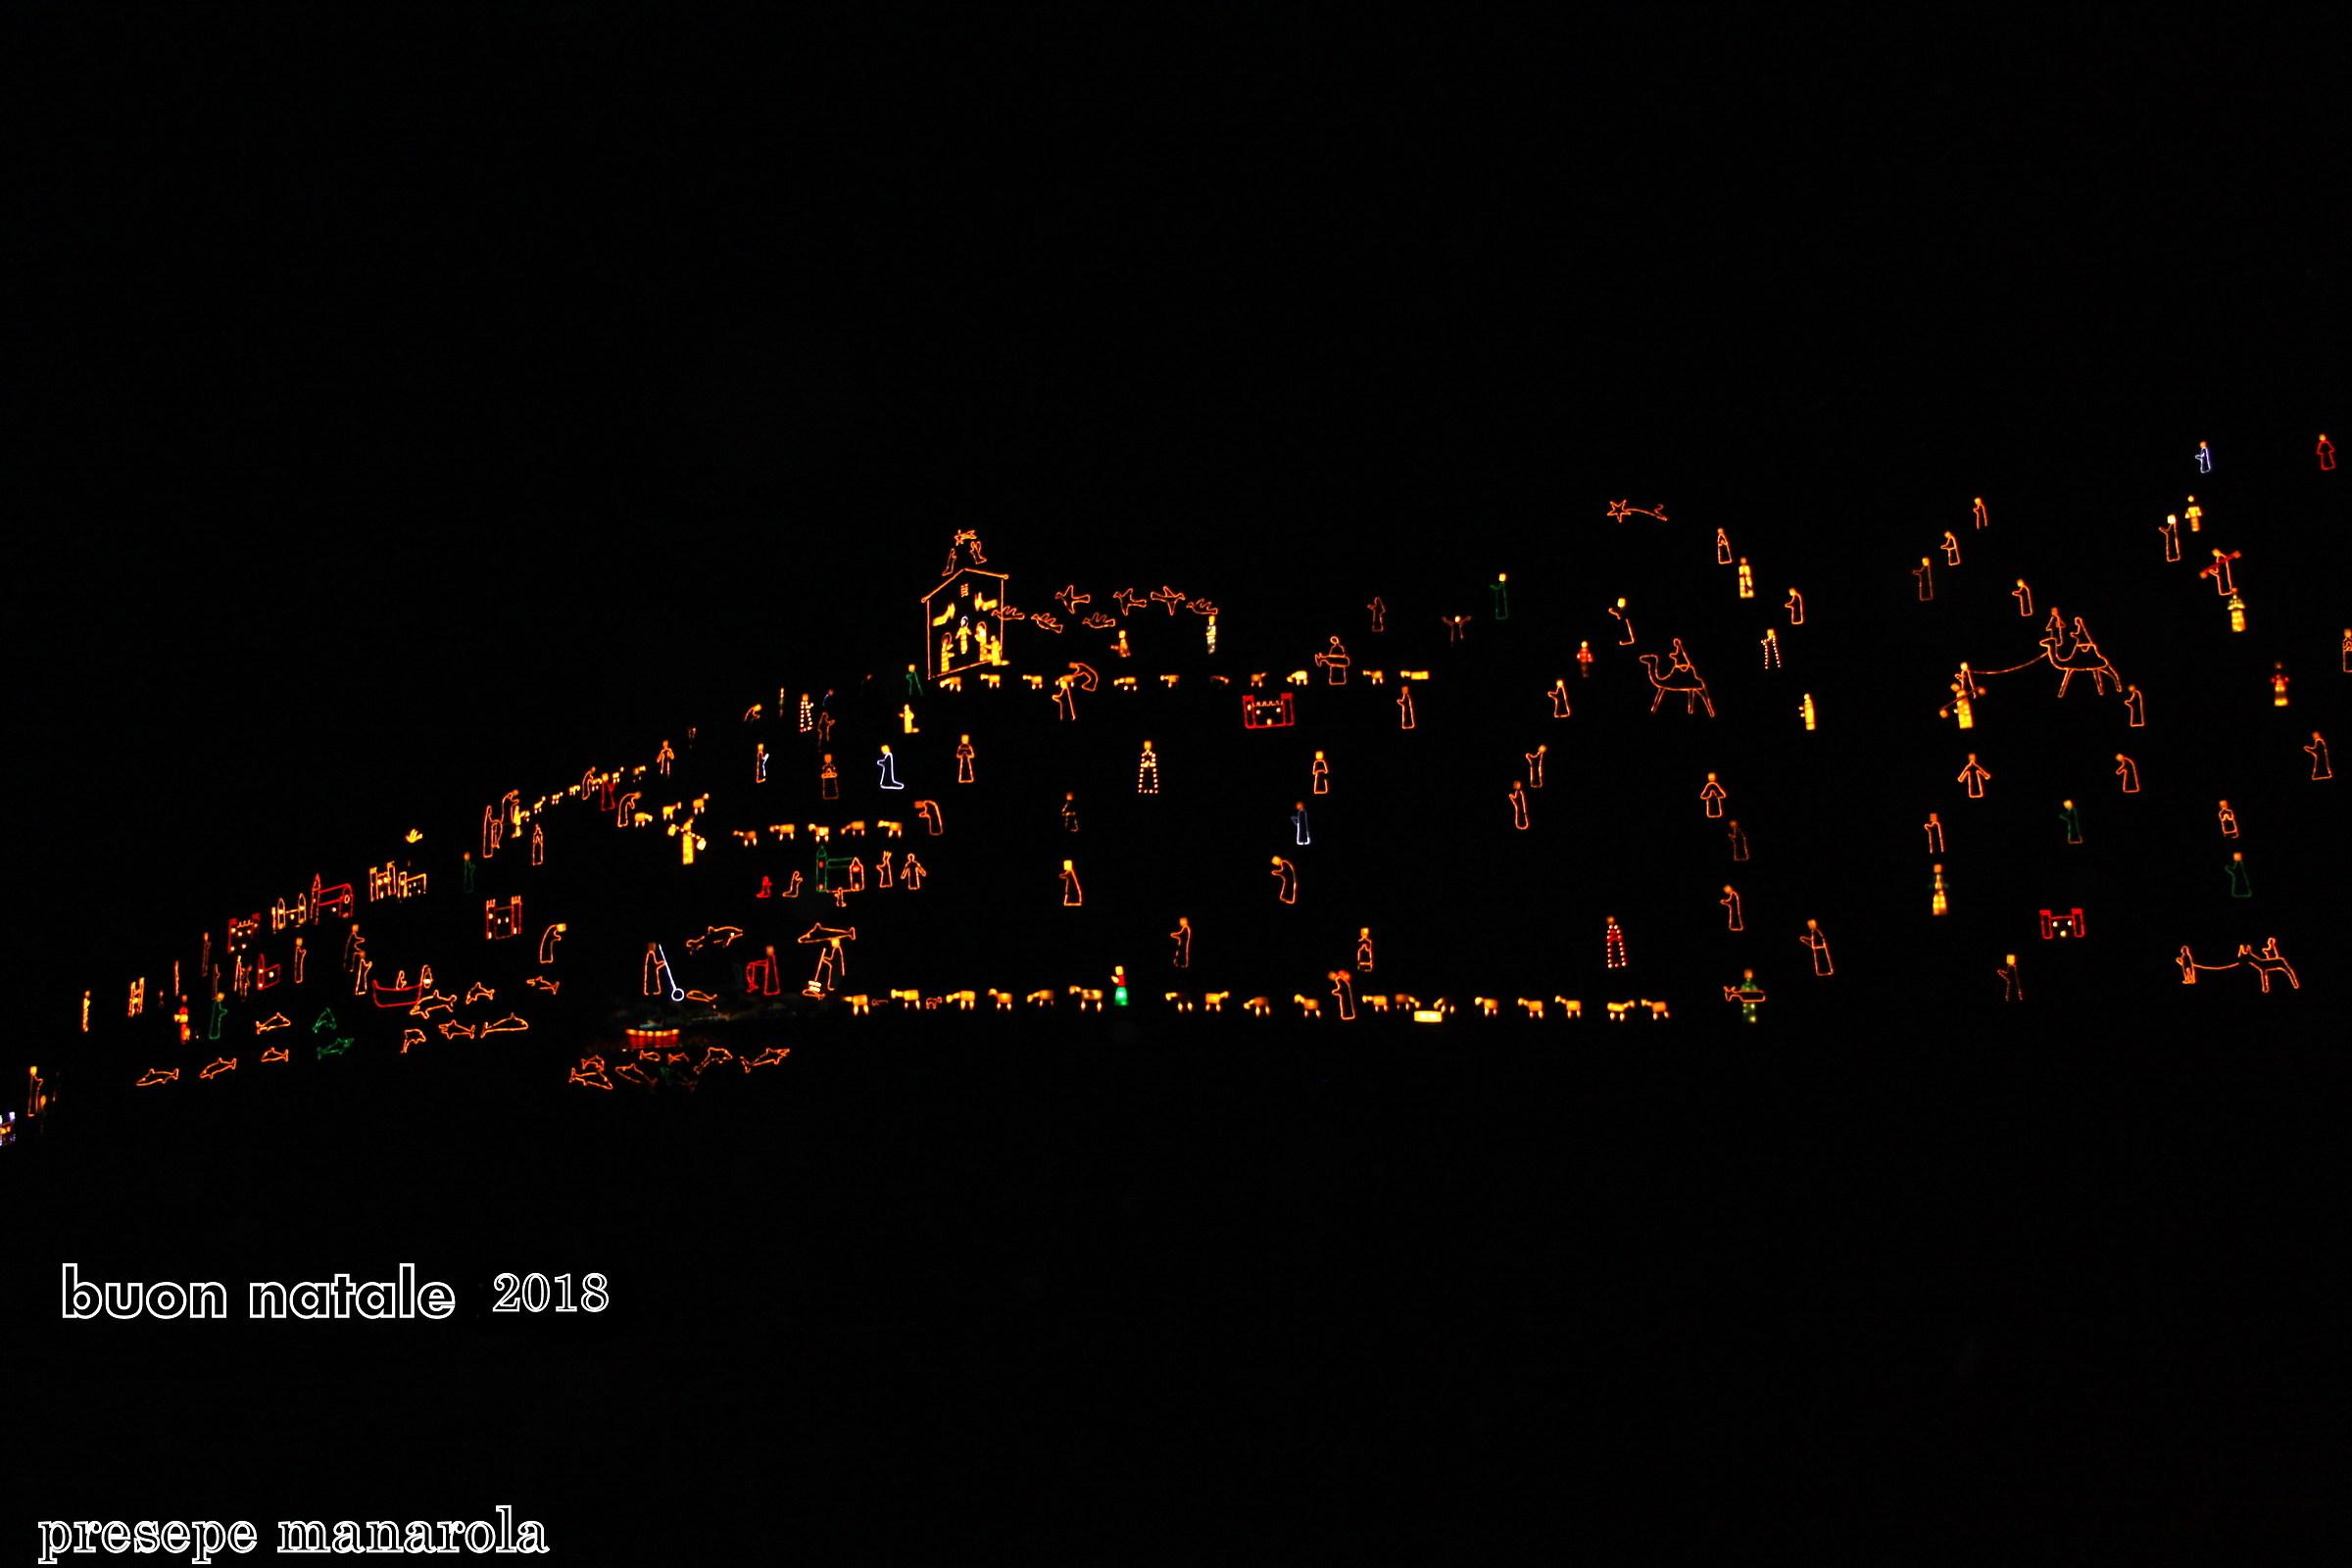 8159-Manarola's luminous nativity scene...